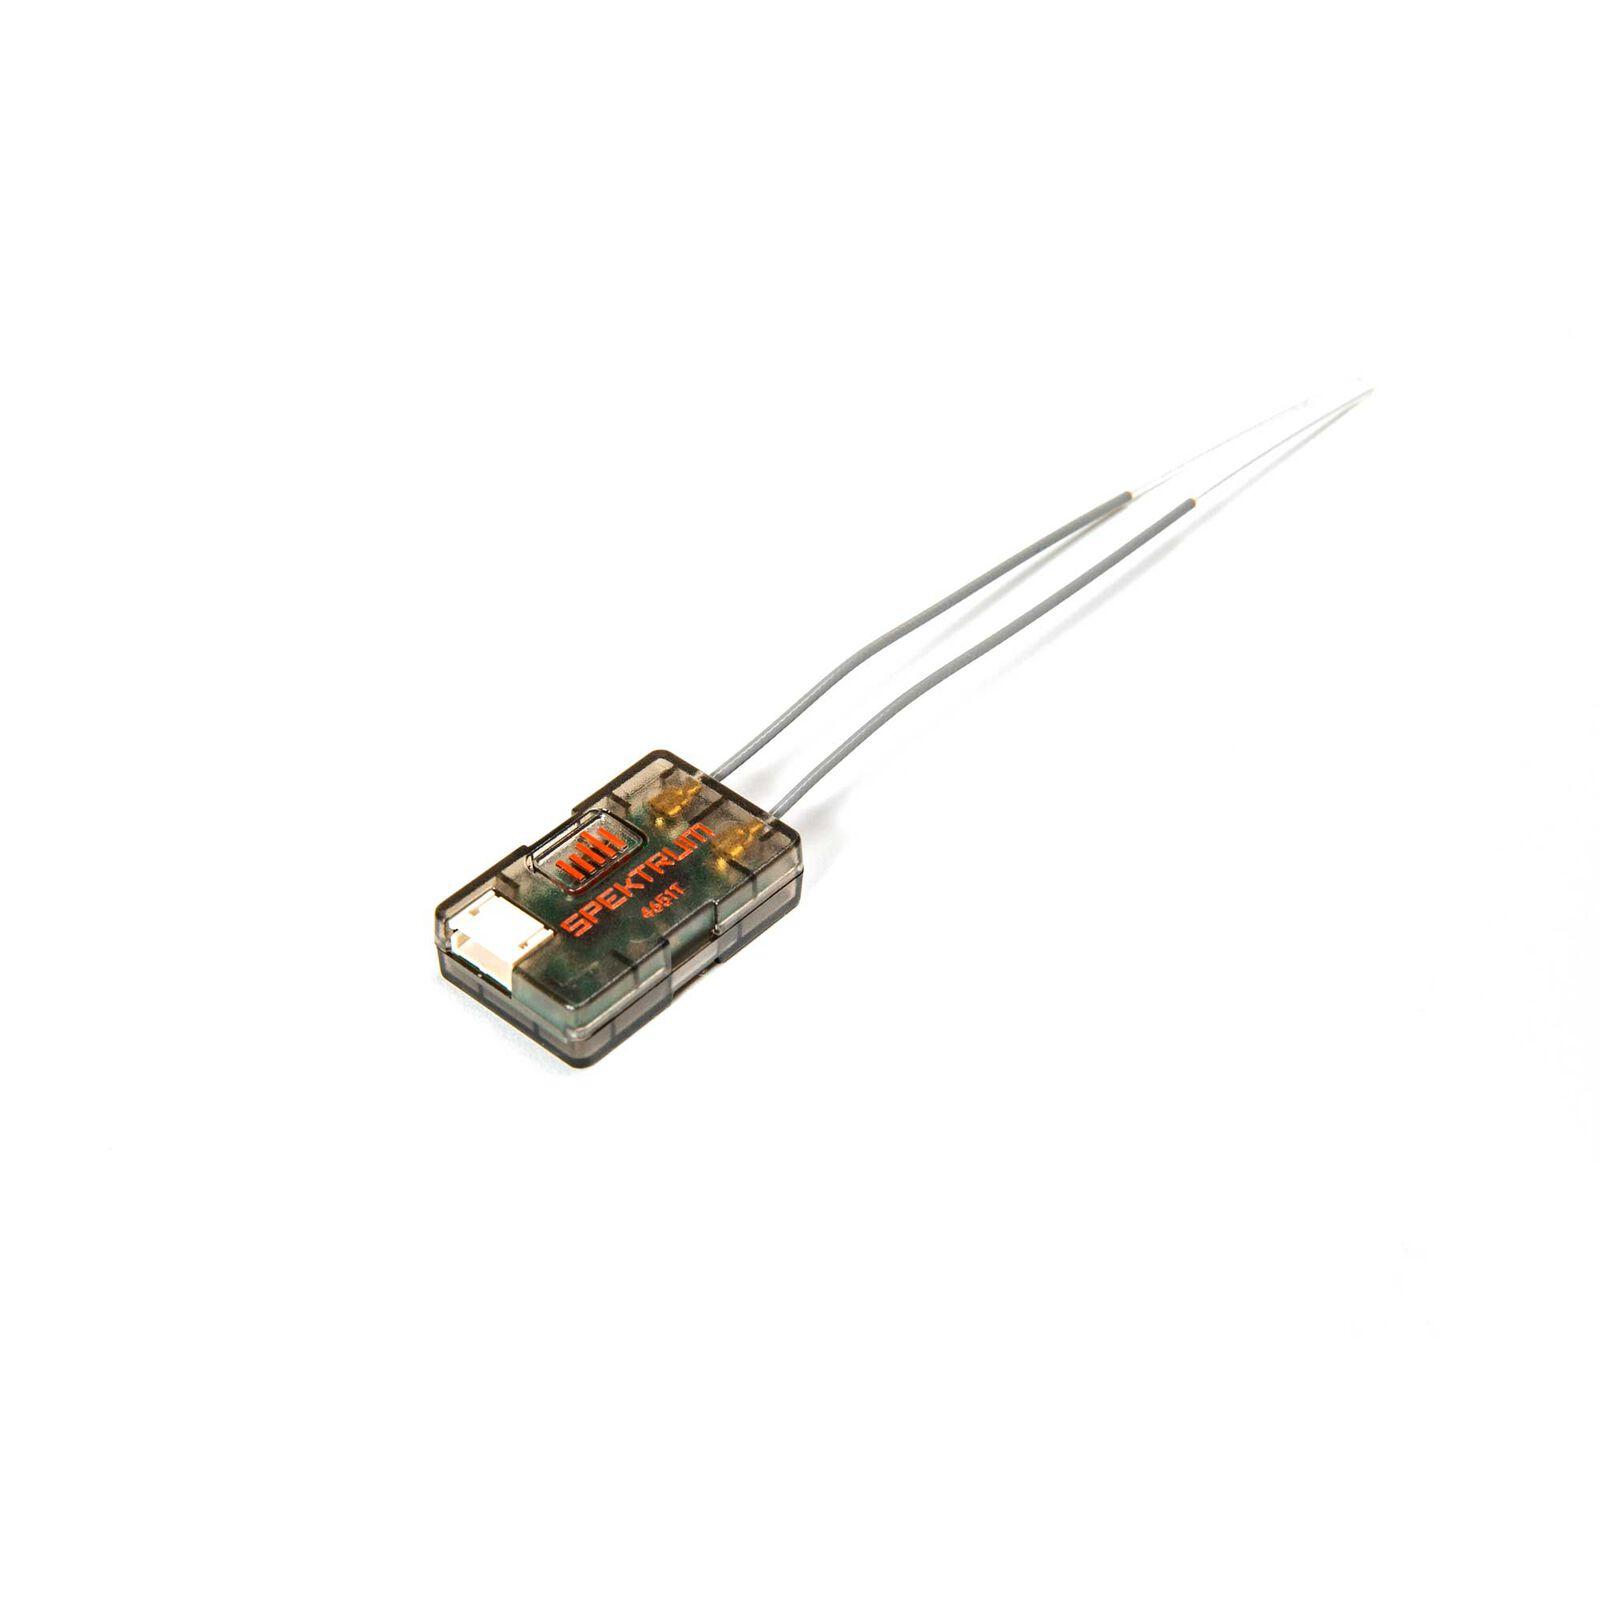 SRXL2 DSMX Remote Serial Telemetry Receiver